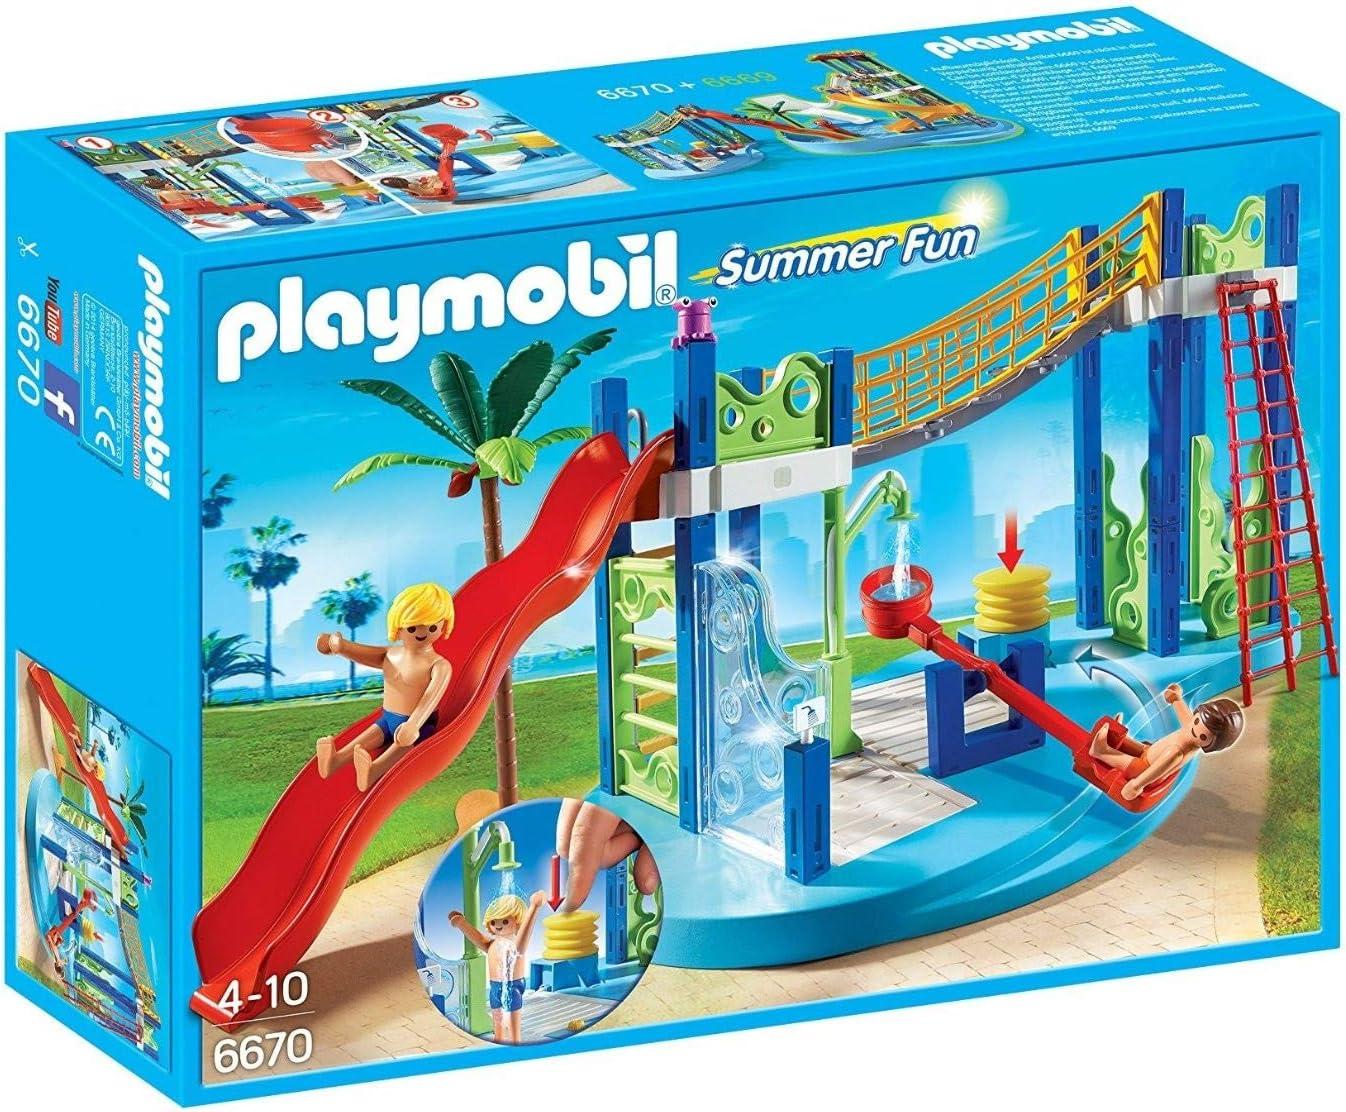 Playmobil Summer Fun Water Park Play Area Juego de construcción - Juguetes de construcción (Juego de construcción, Multicolor, 4 año(s), Niño/niña, 10 año(s), 24 cm)